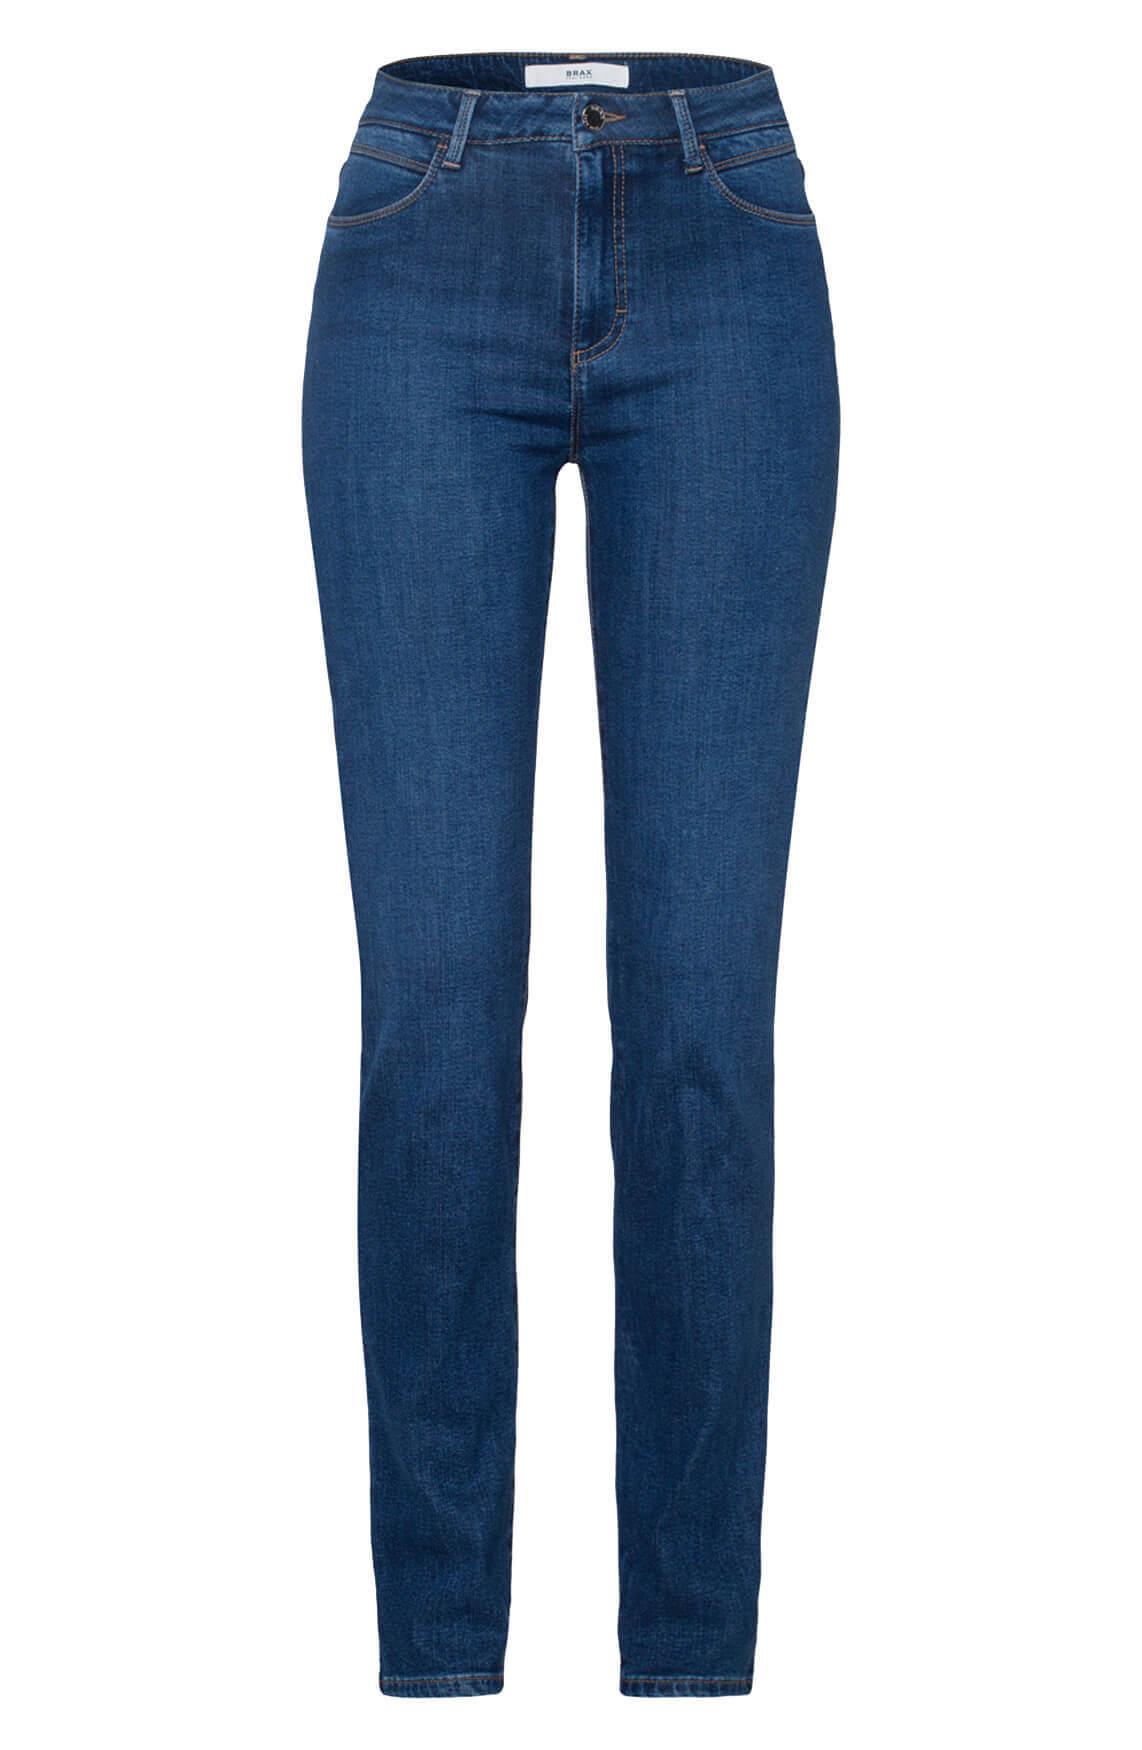 Brax Dames Shakira skinny jeans Blauw